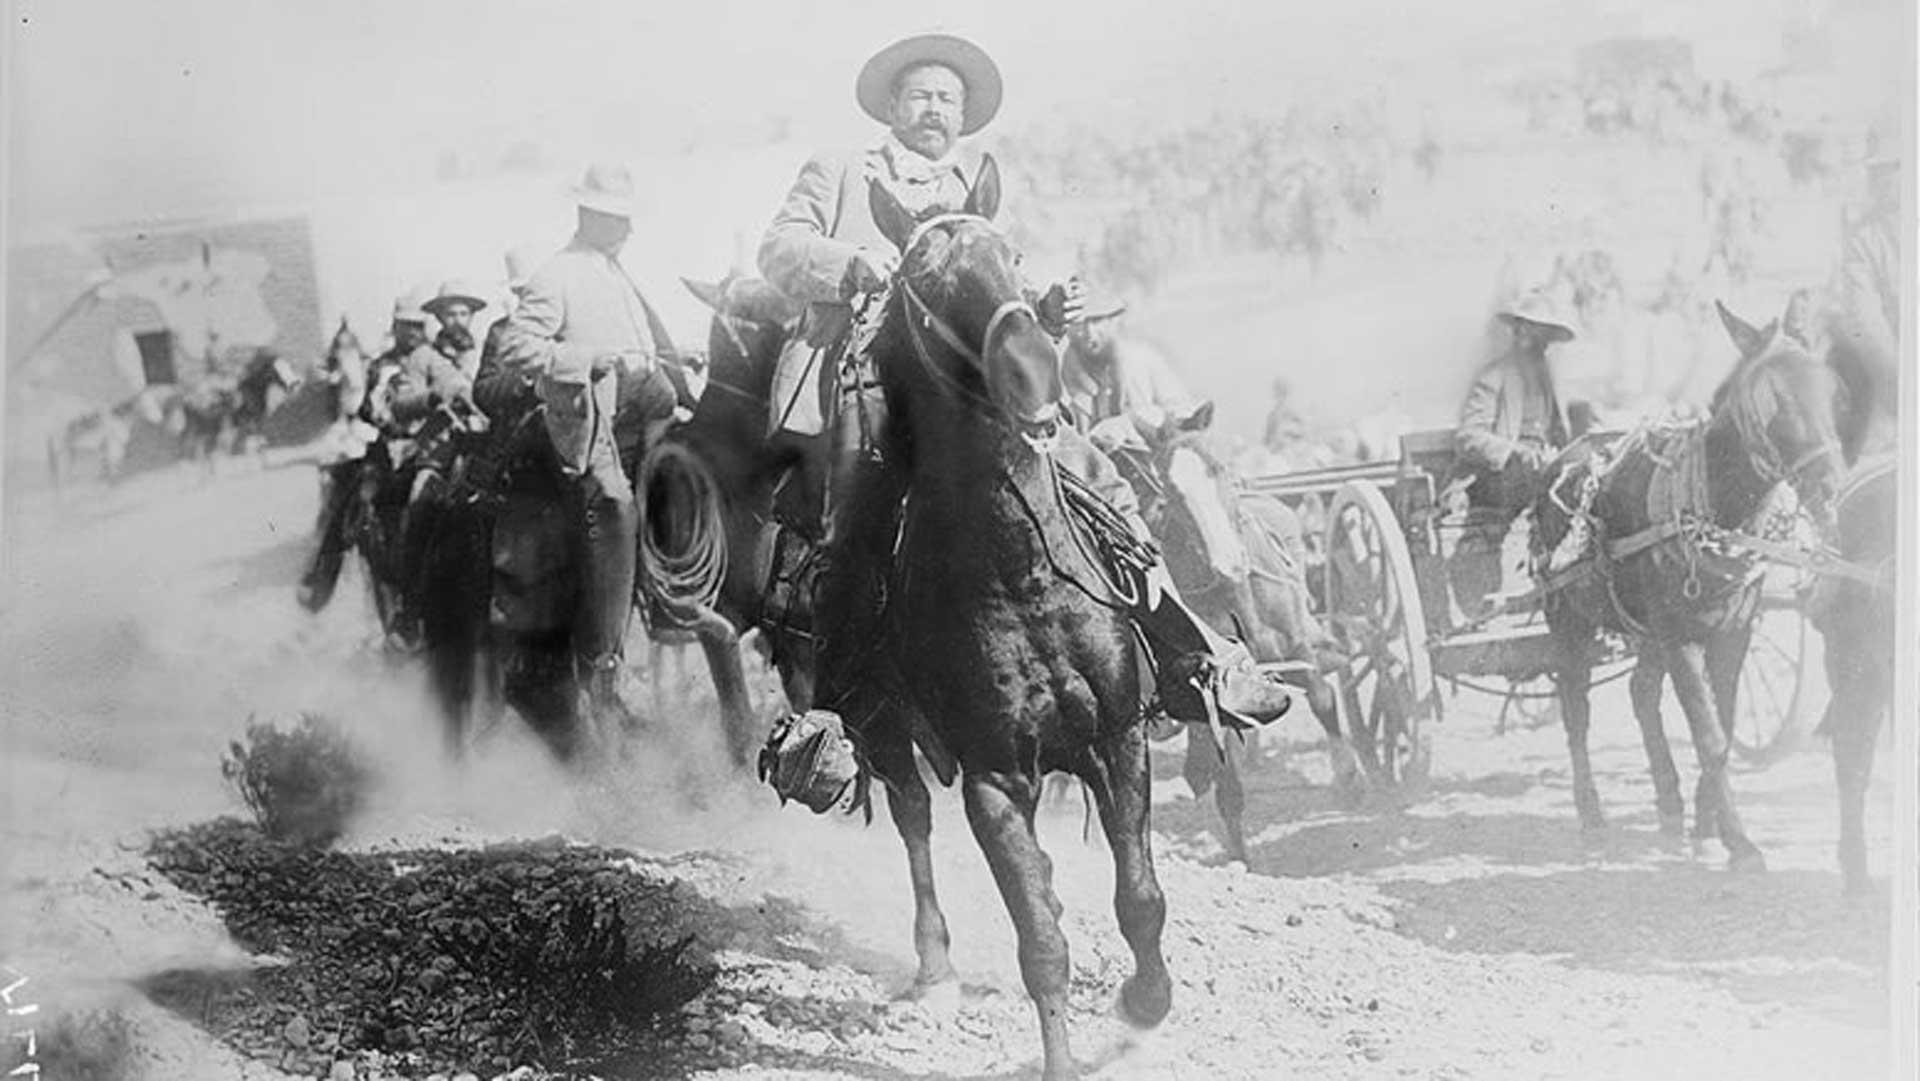 General Francisco 'Pancho' Villa on horseback, during the Mexican Revolution, 1914.